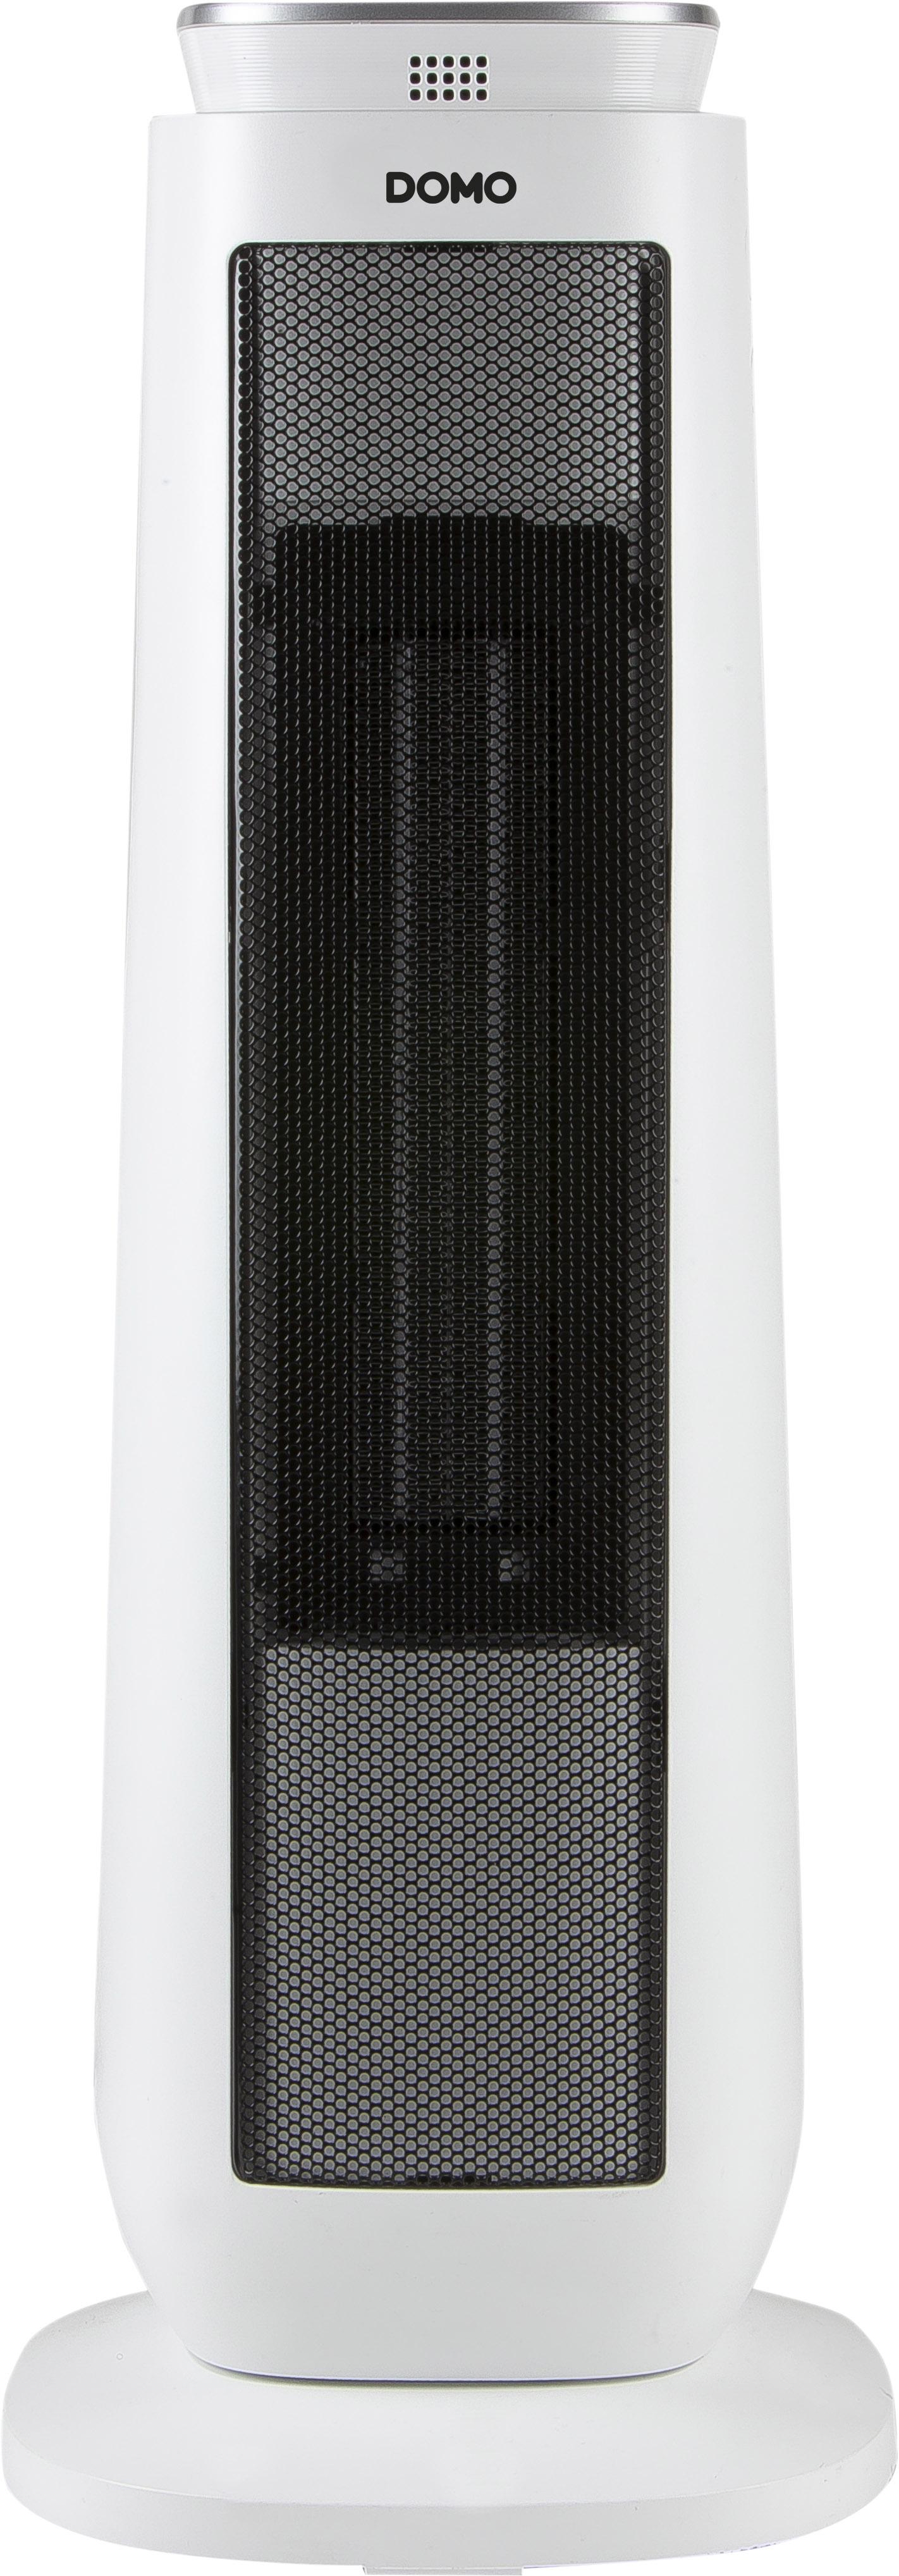 Domo - Ceramic Pedestal Heater